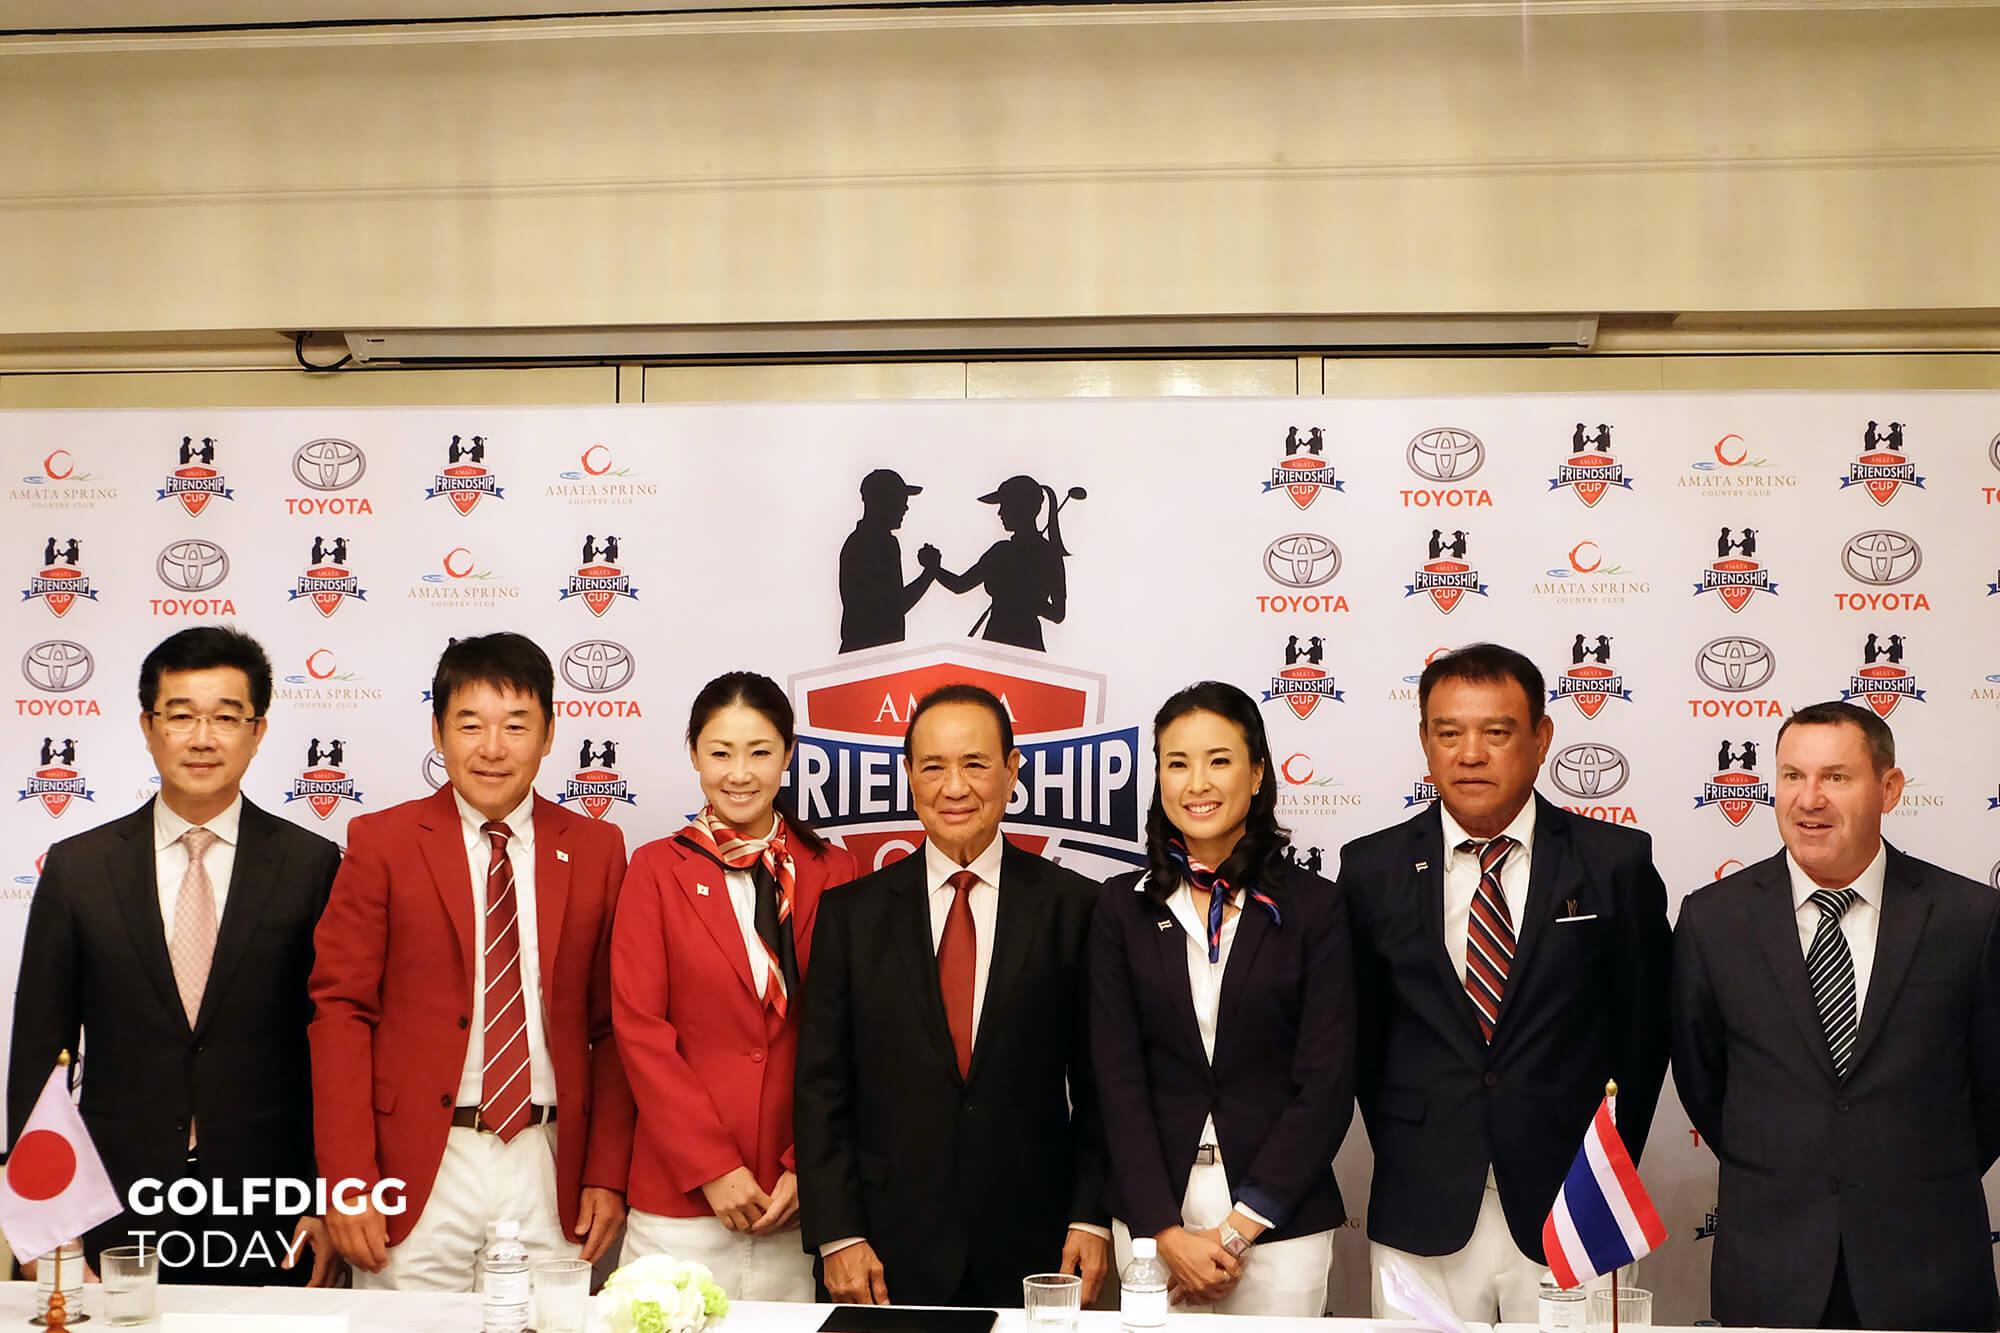 golf_amatafriendshipcup_amatafriendshipcup2018_presented_by_toyota_thai_japan_03